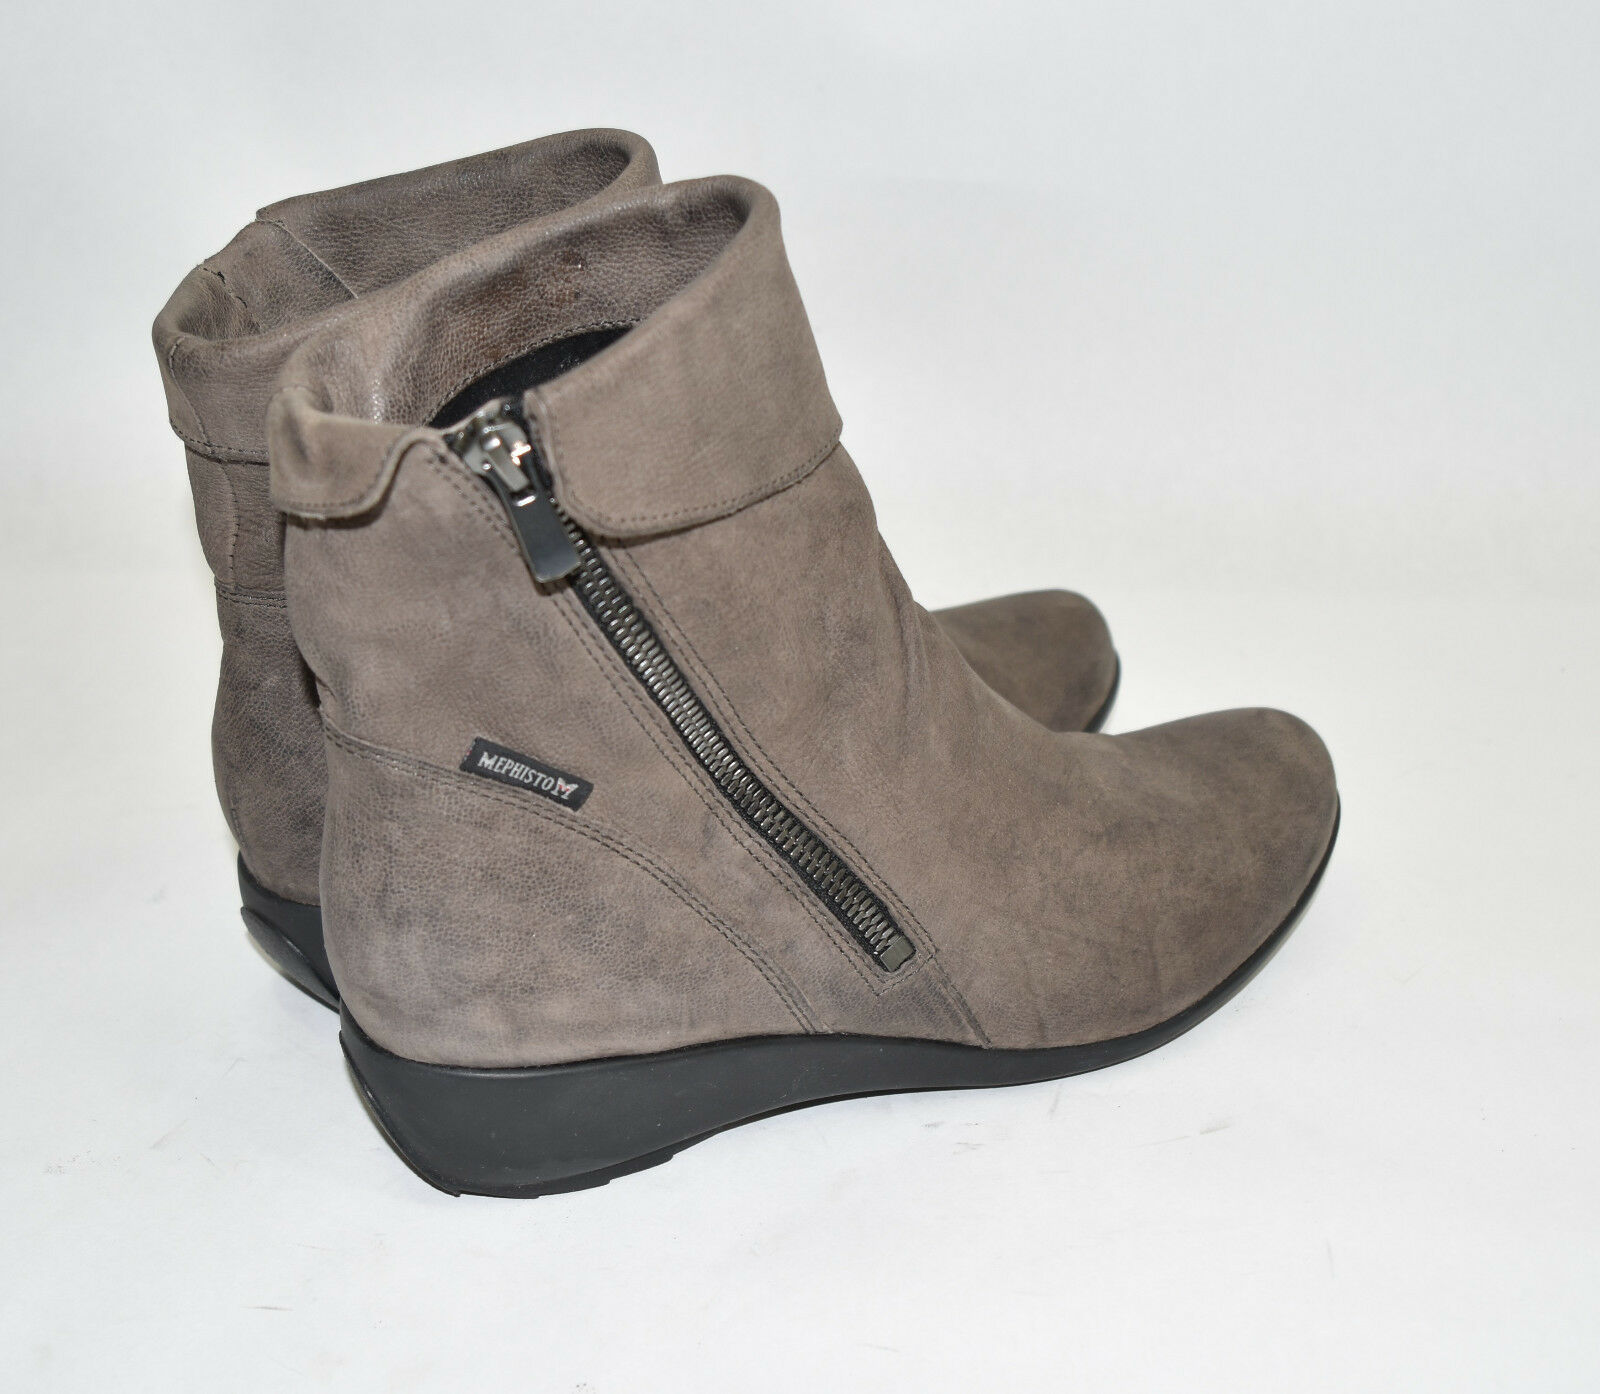 Mephisto 'Seddy' Wedge Wedge Wedge Bootie Pewter  Leder  Size 8 US $400 dedc50